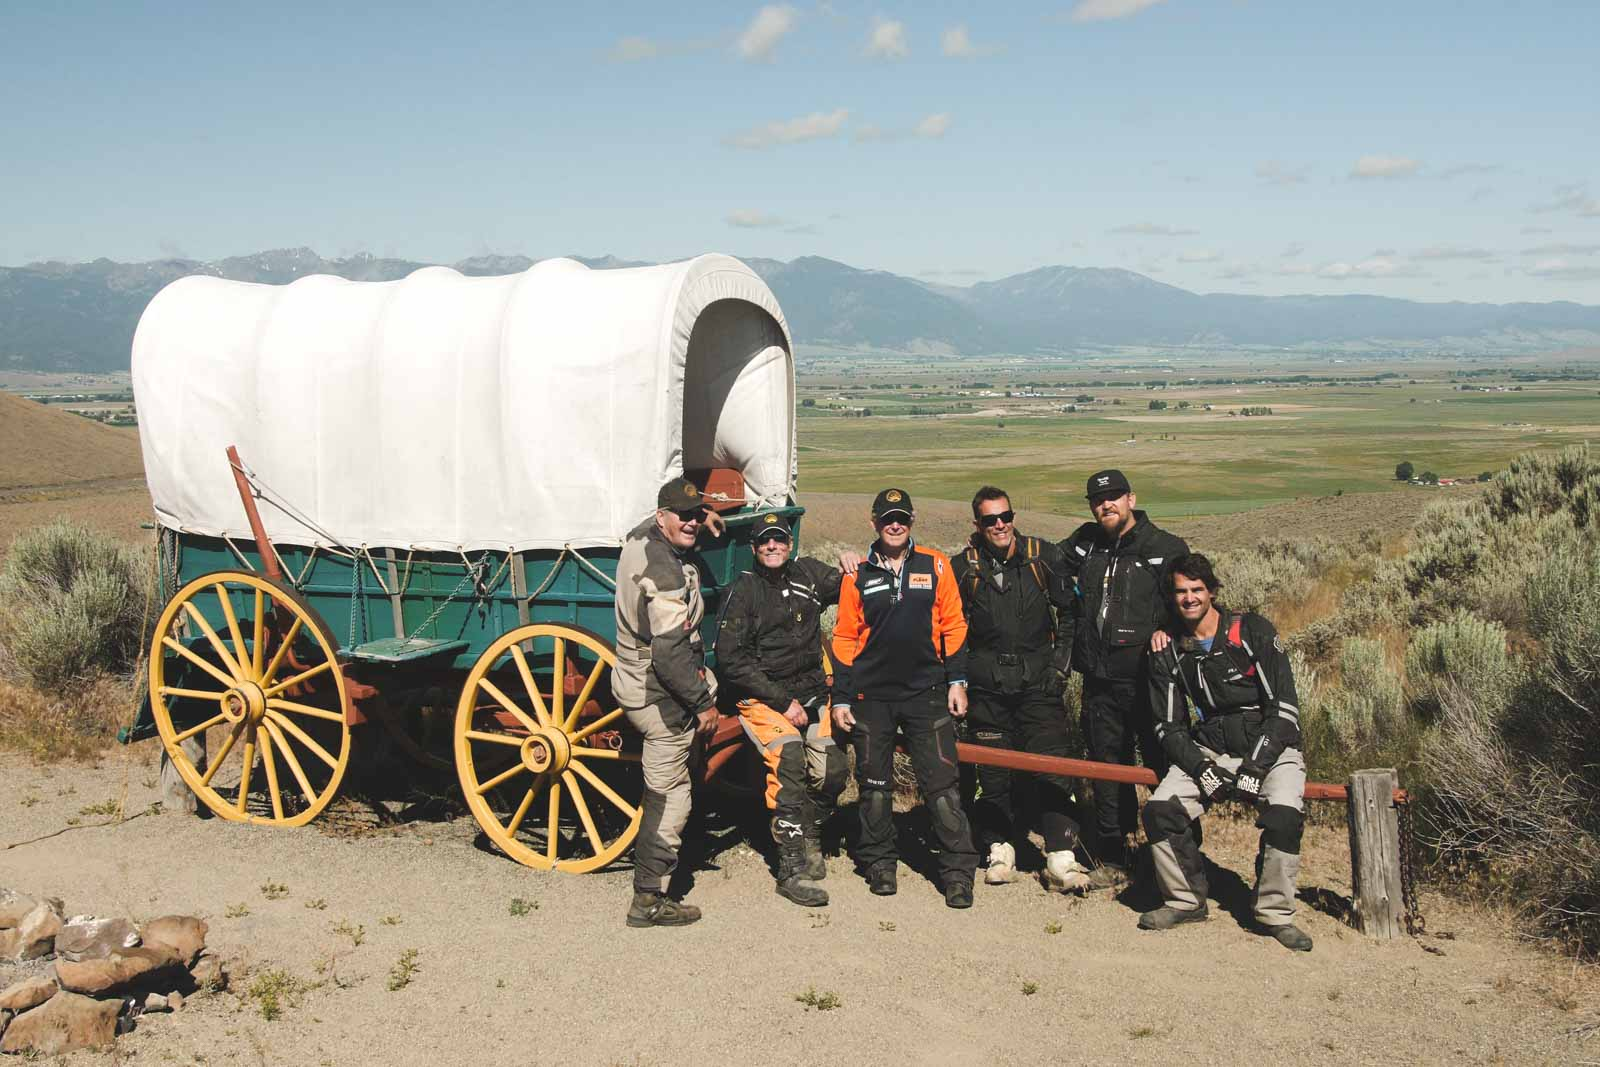 adv-pioneers-adventure-motorcycle-tour-oregon-1